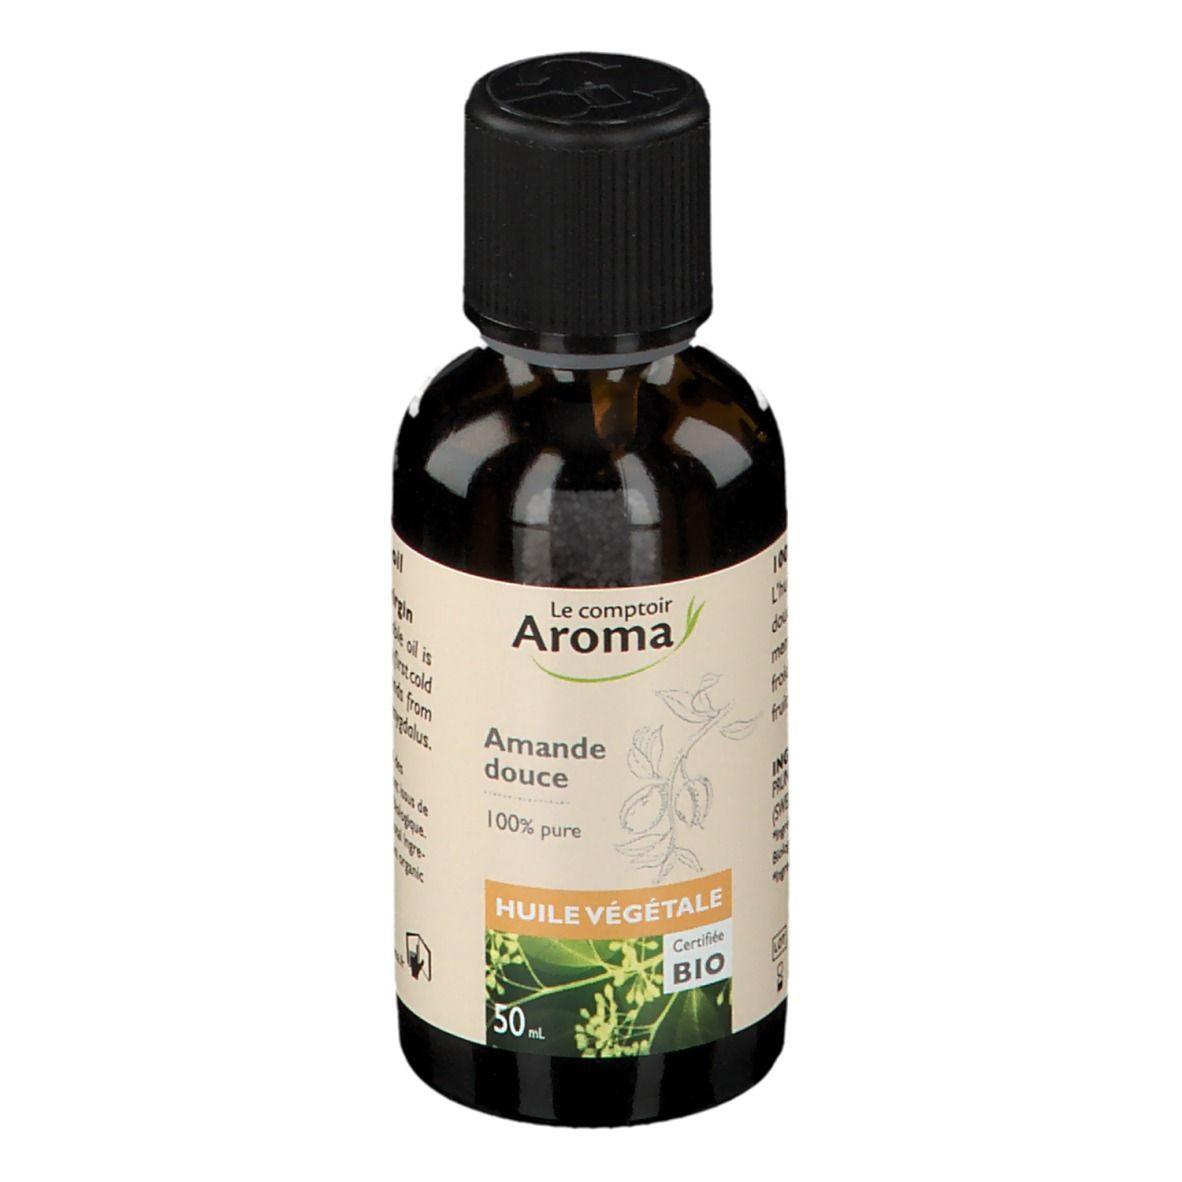 Le Comptoir Aroma Huile Végétale Bio d'Amande douce ml huile